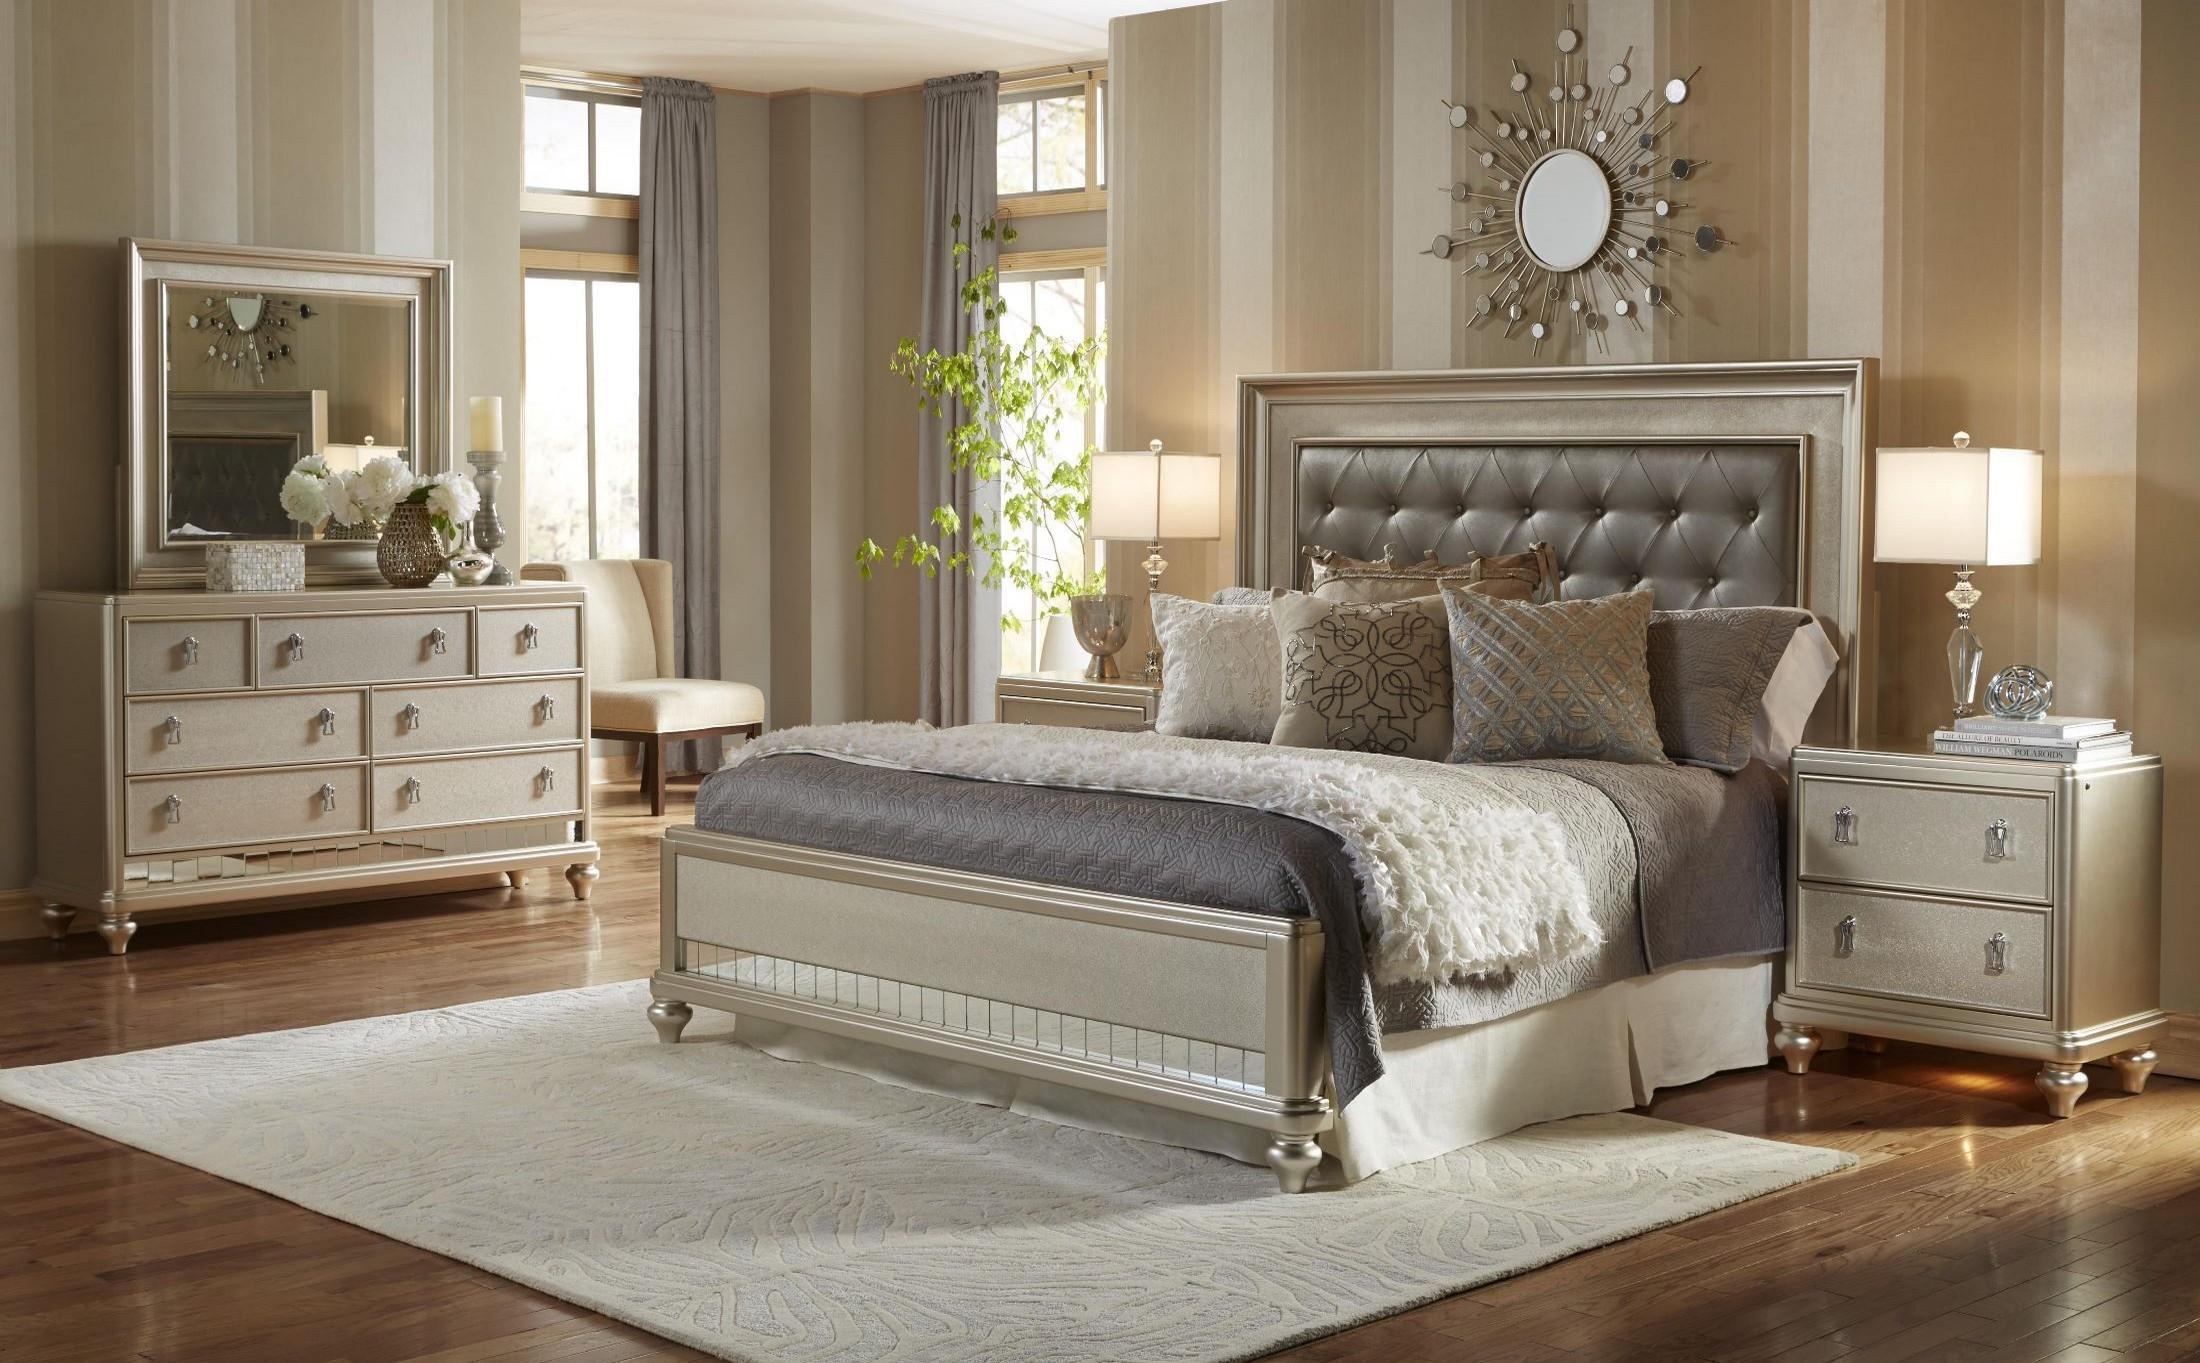 Diva Metallic Panel Bedroom Set. Diva Panel Bedroom Set from Samuel Lawrence  8808 255 257 400